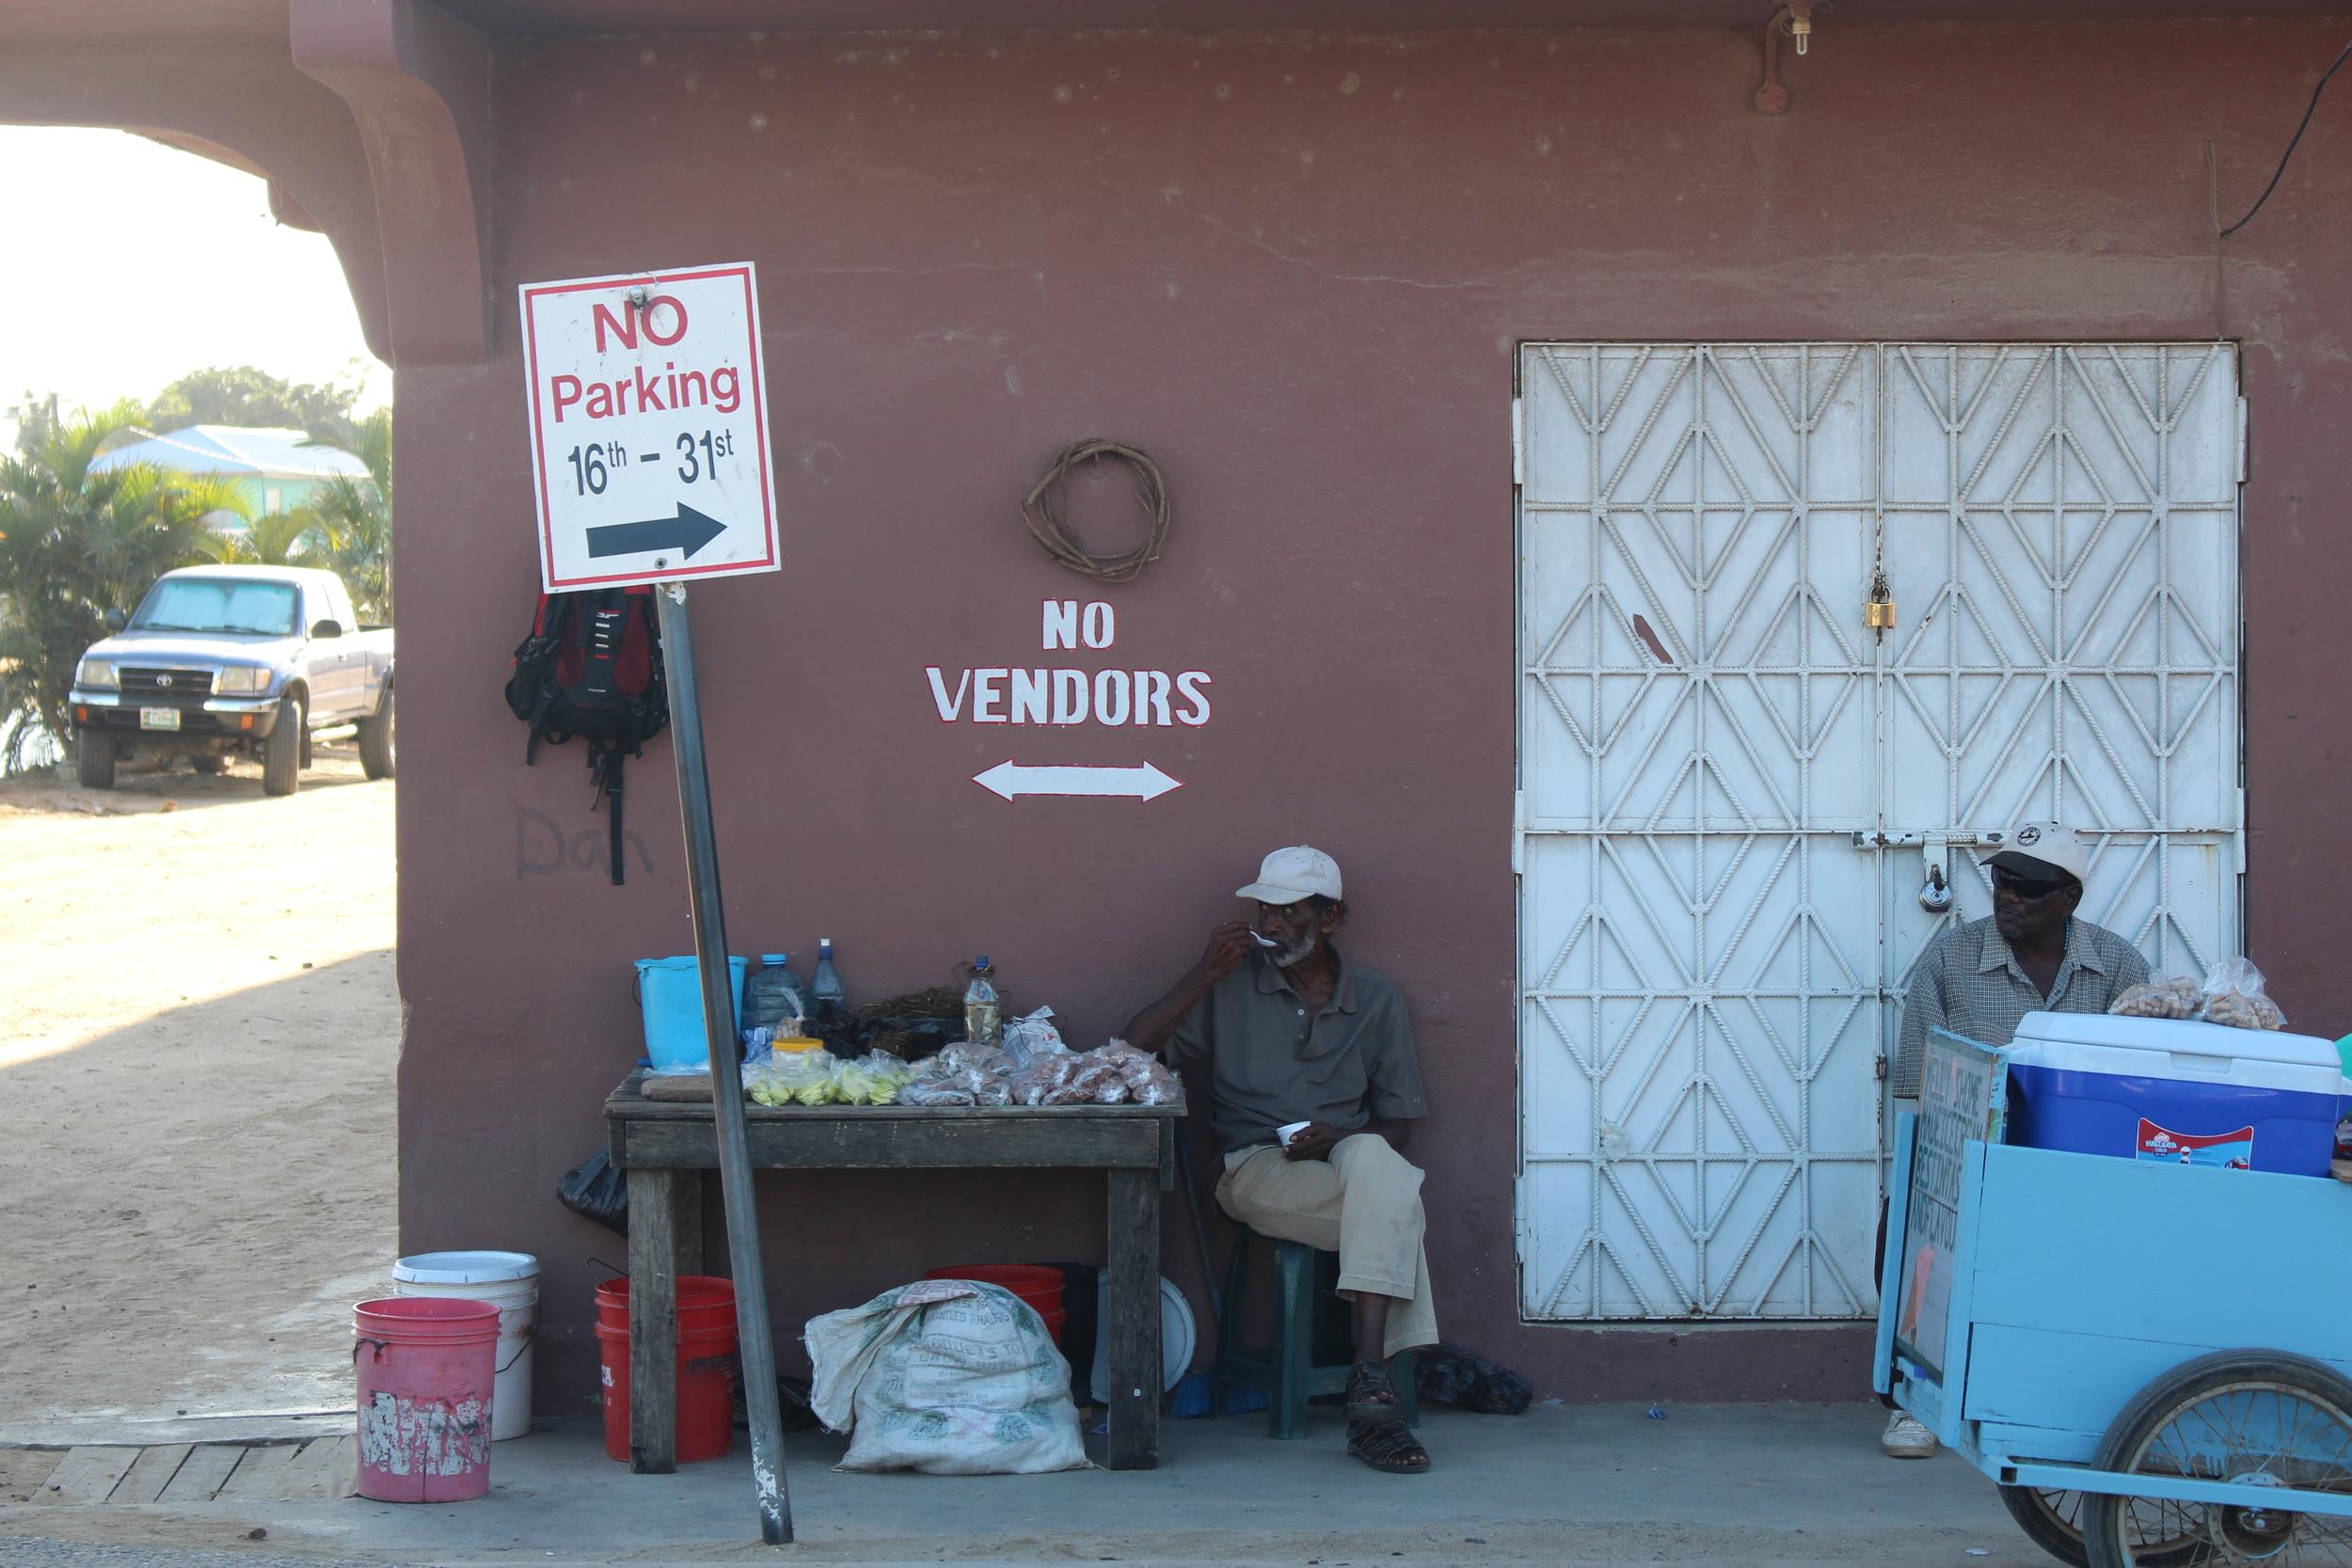 A Belizean vendor delightfully ignores the sign